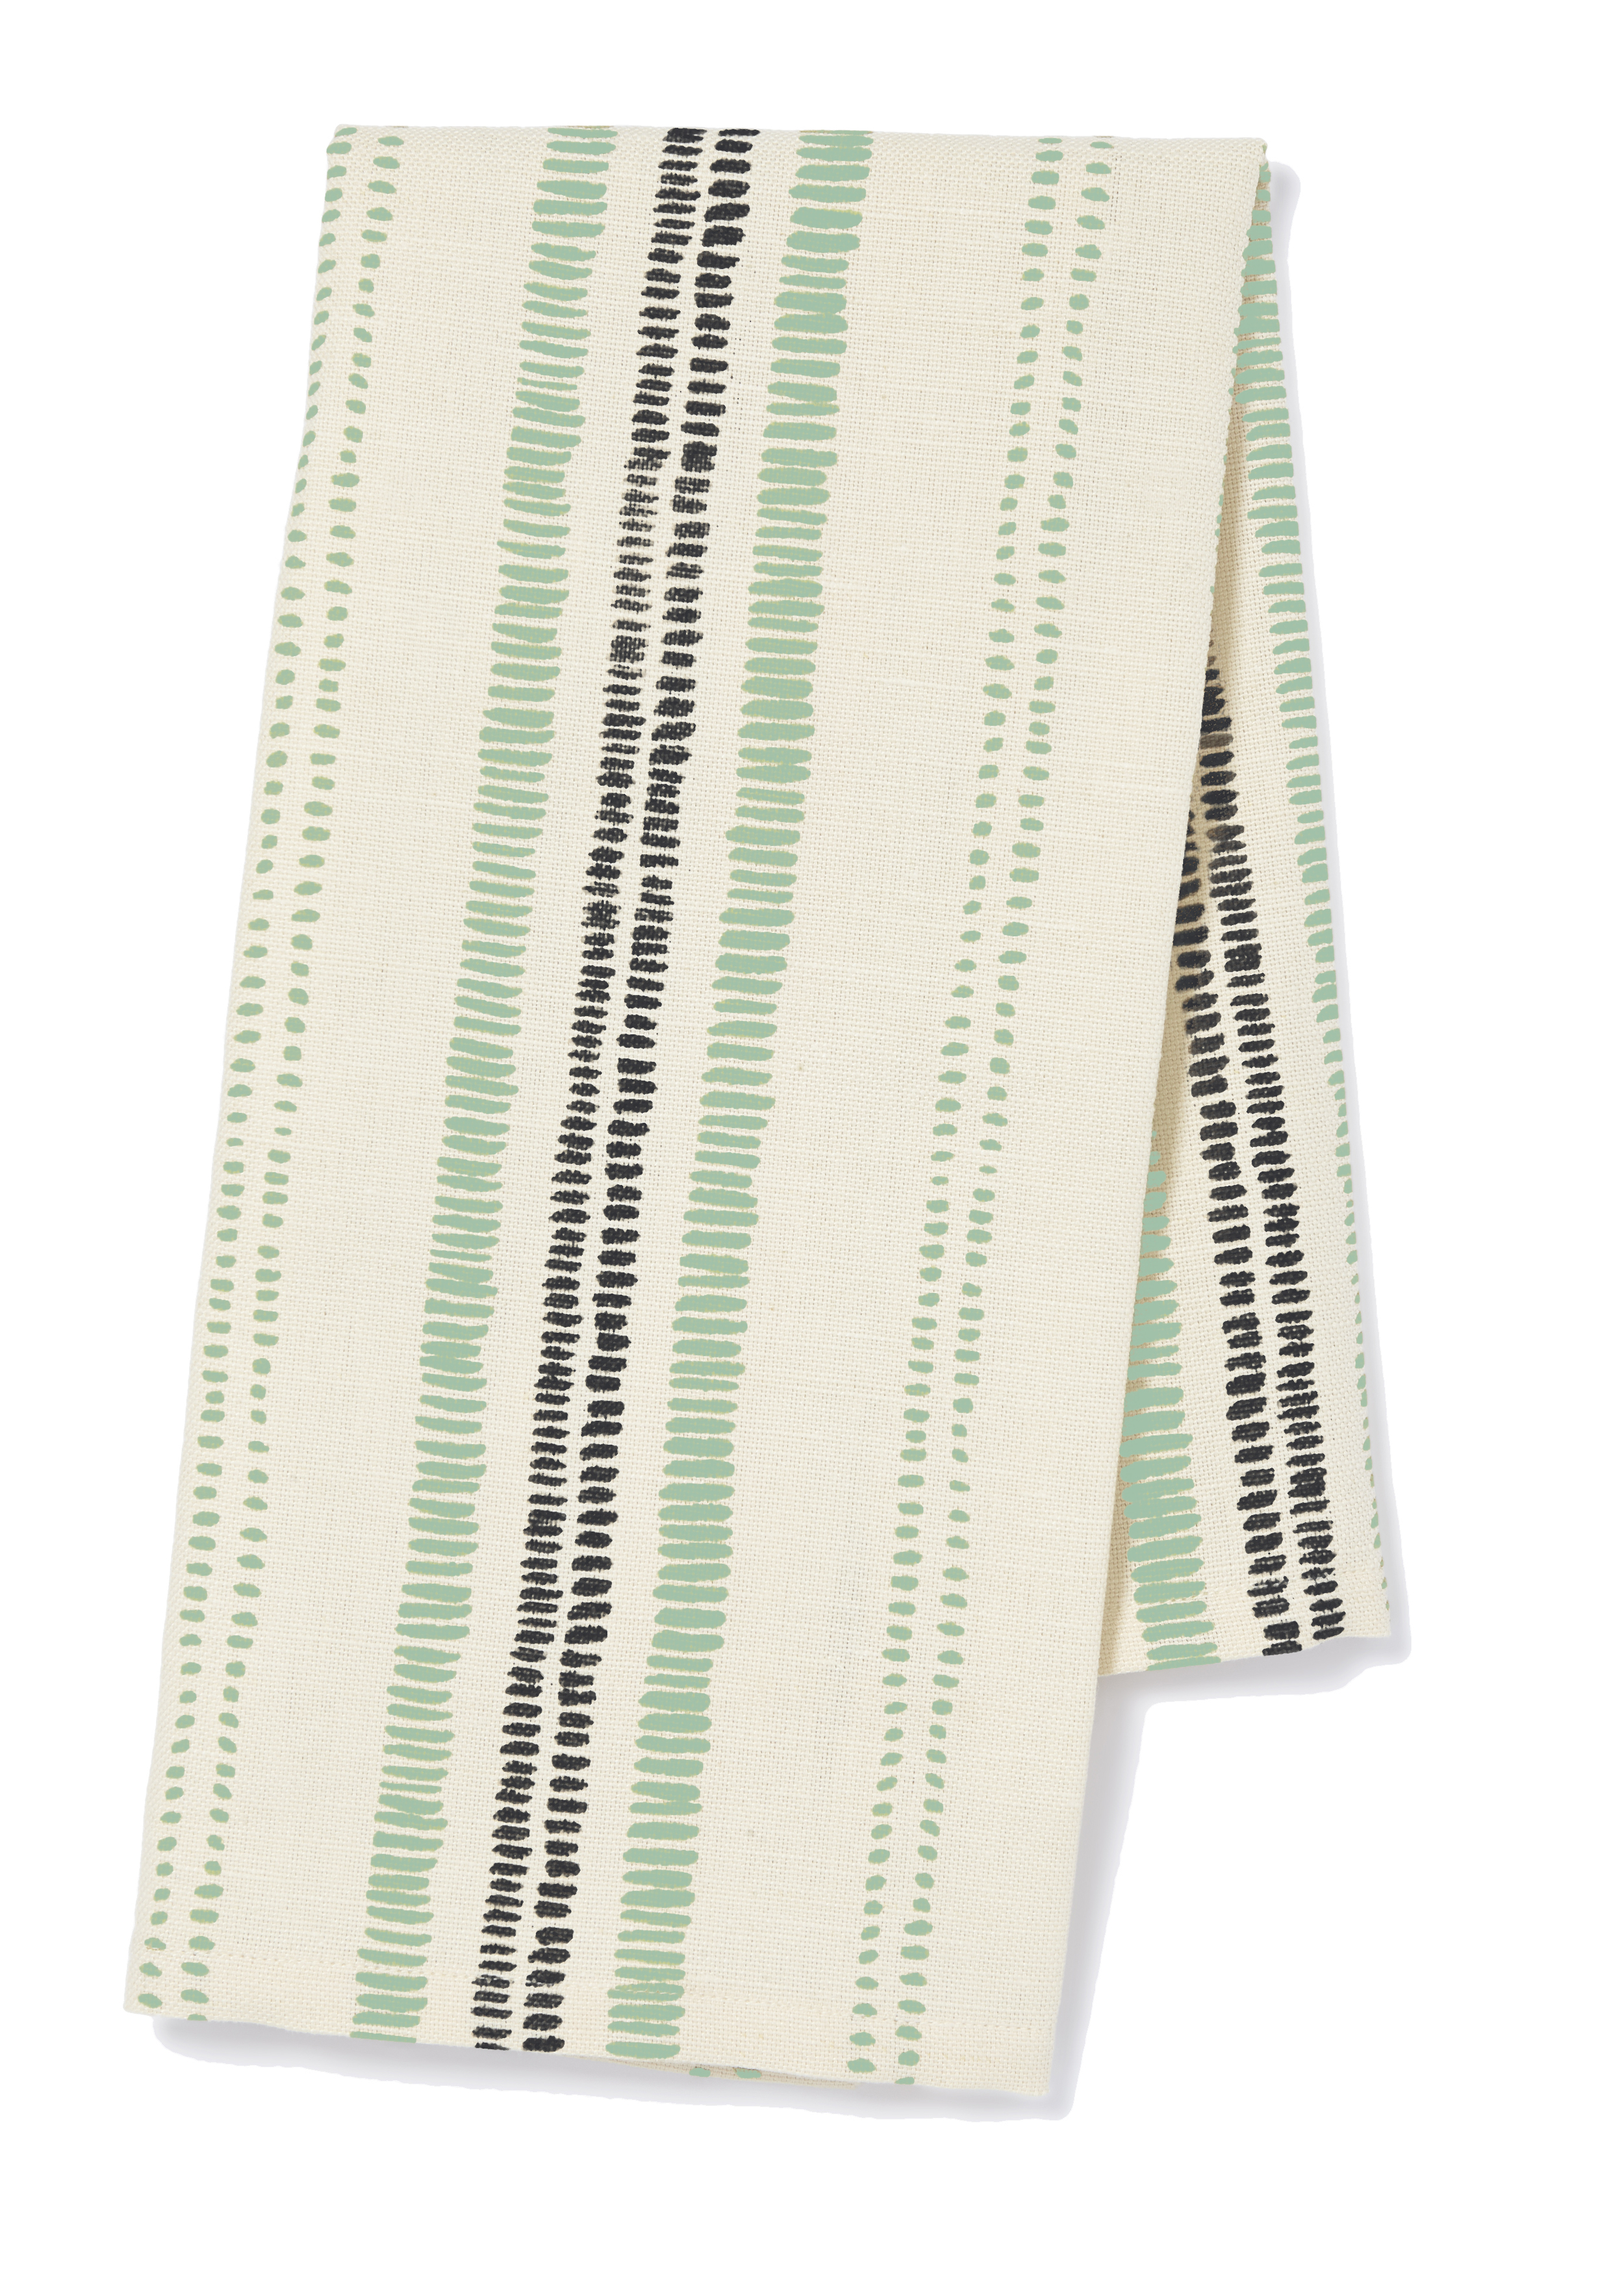 RART02_Grass Indigo Railroad Tea Towel.jpg